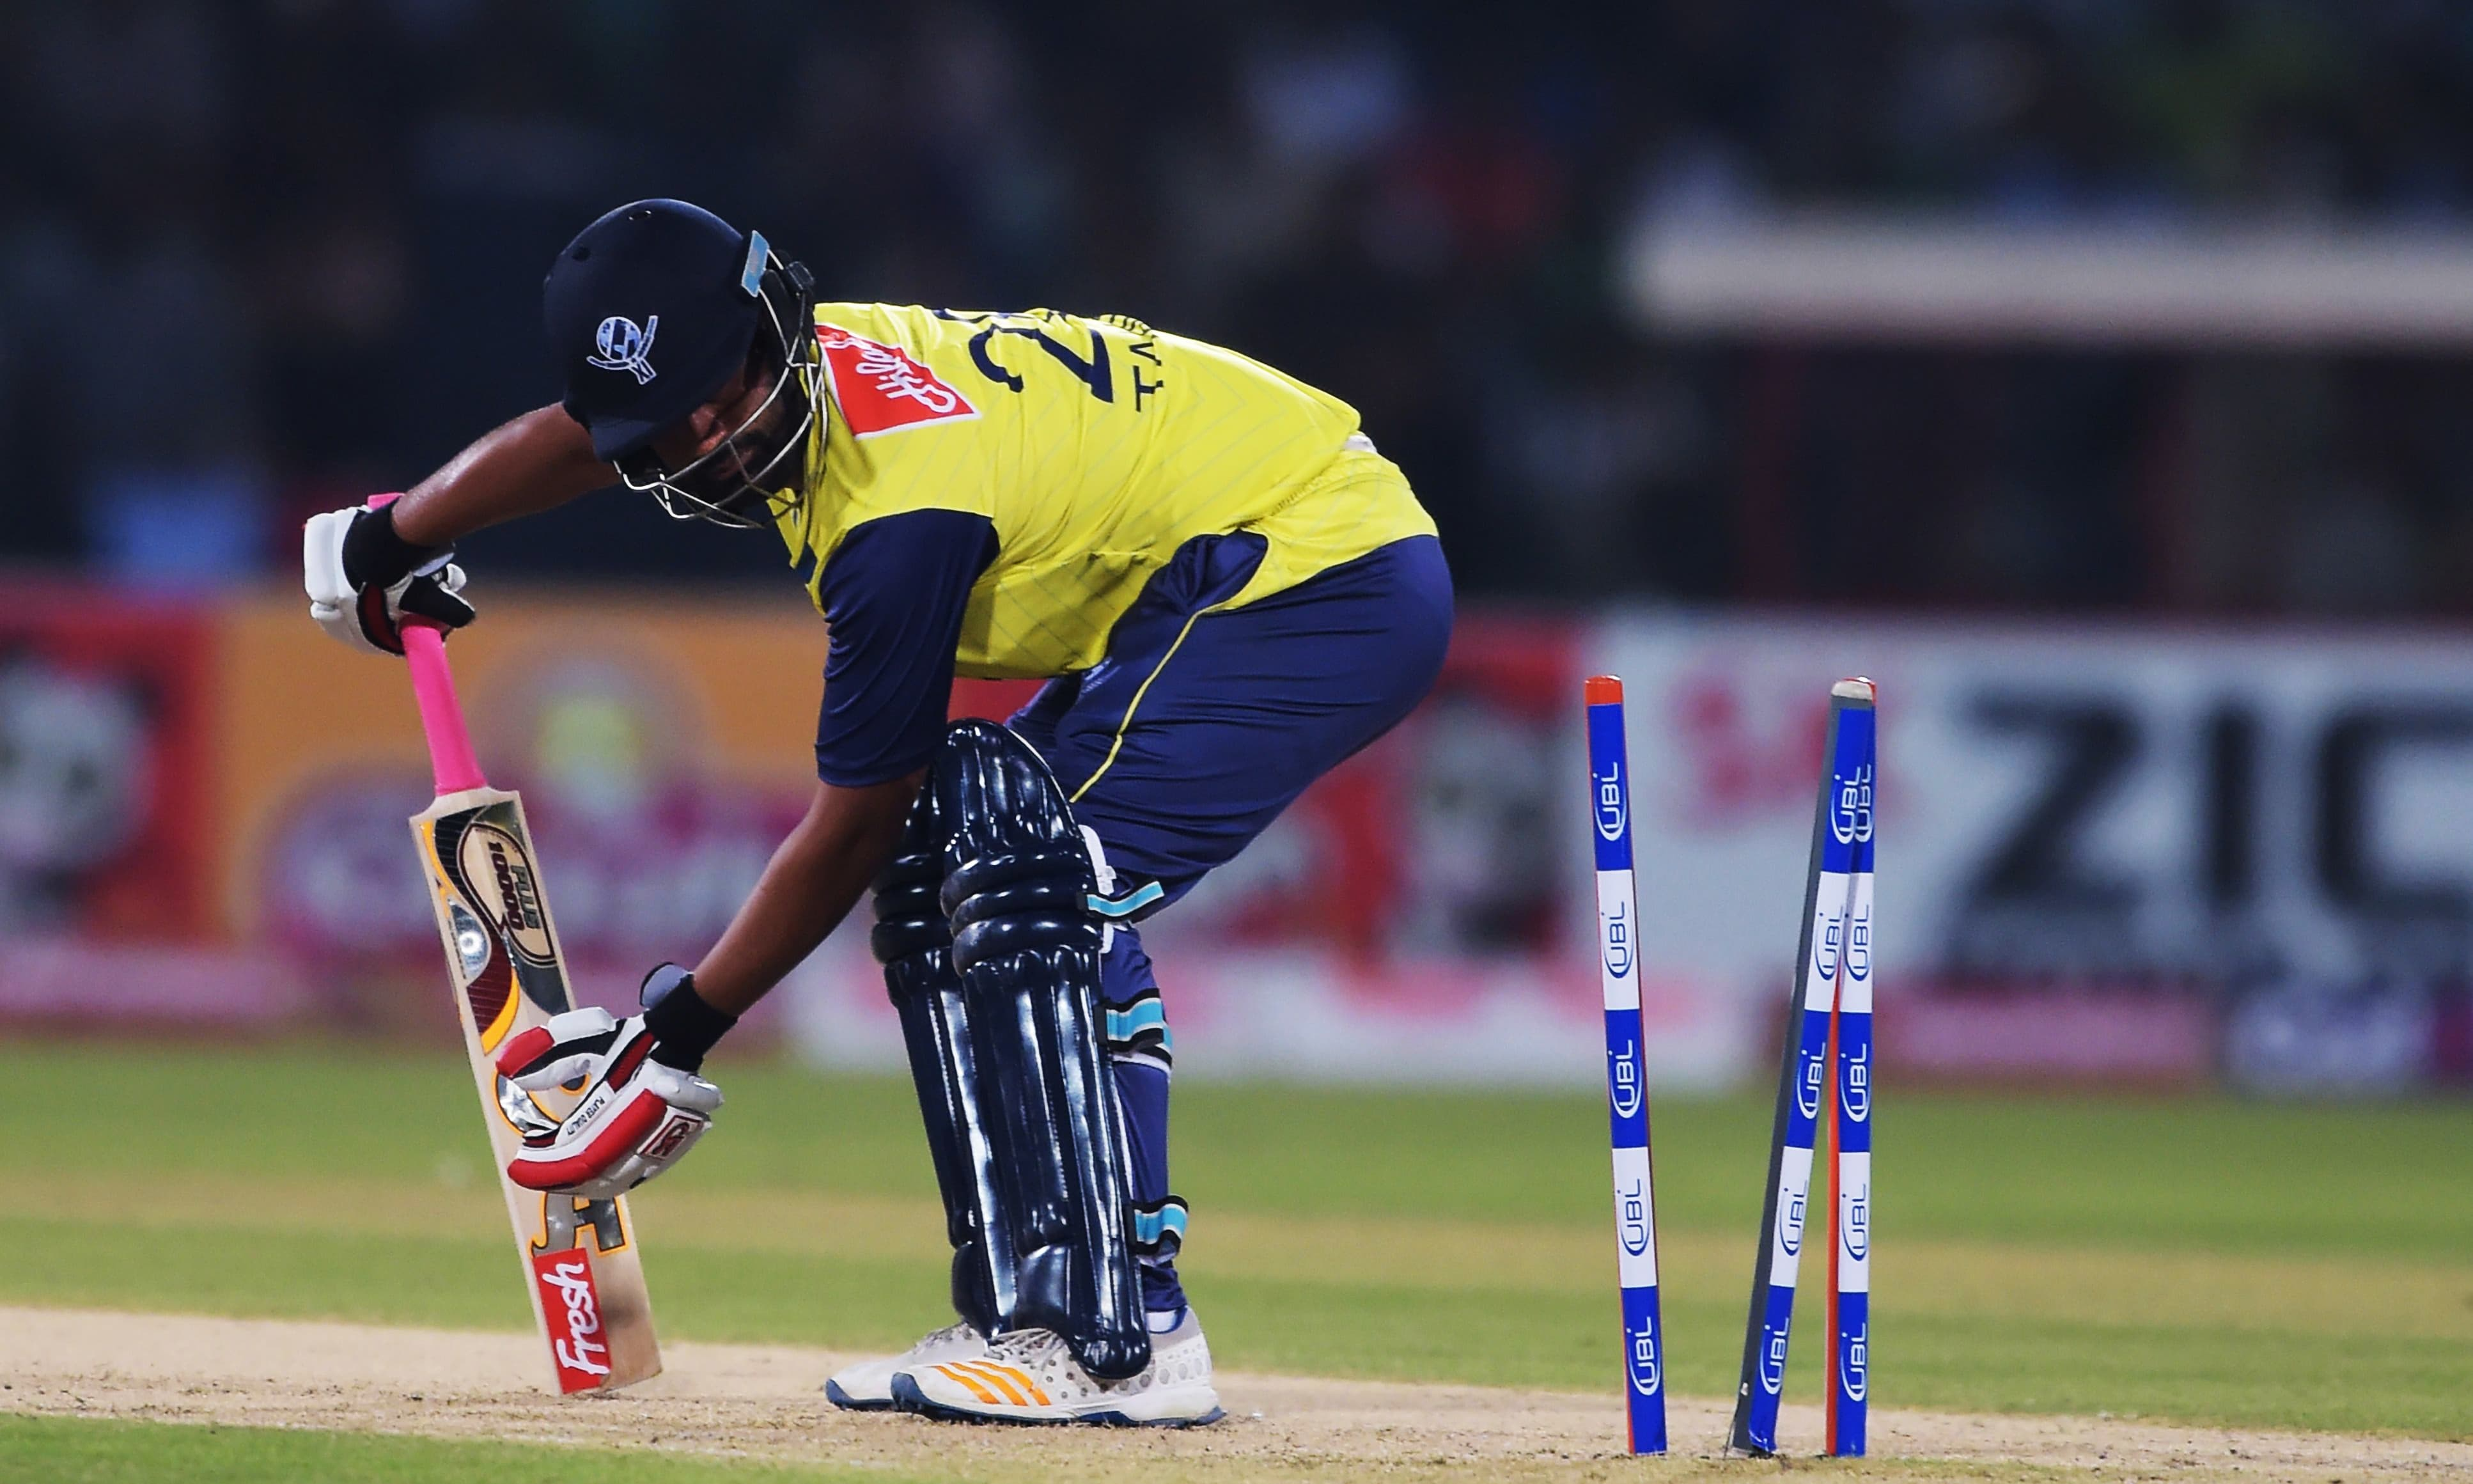 World XI batsman Tamim Iqbal is bowled out by Usman Shinwari. ─ AFP